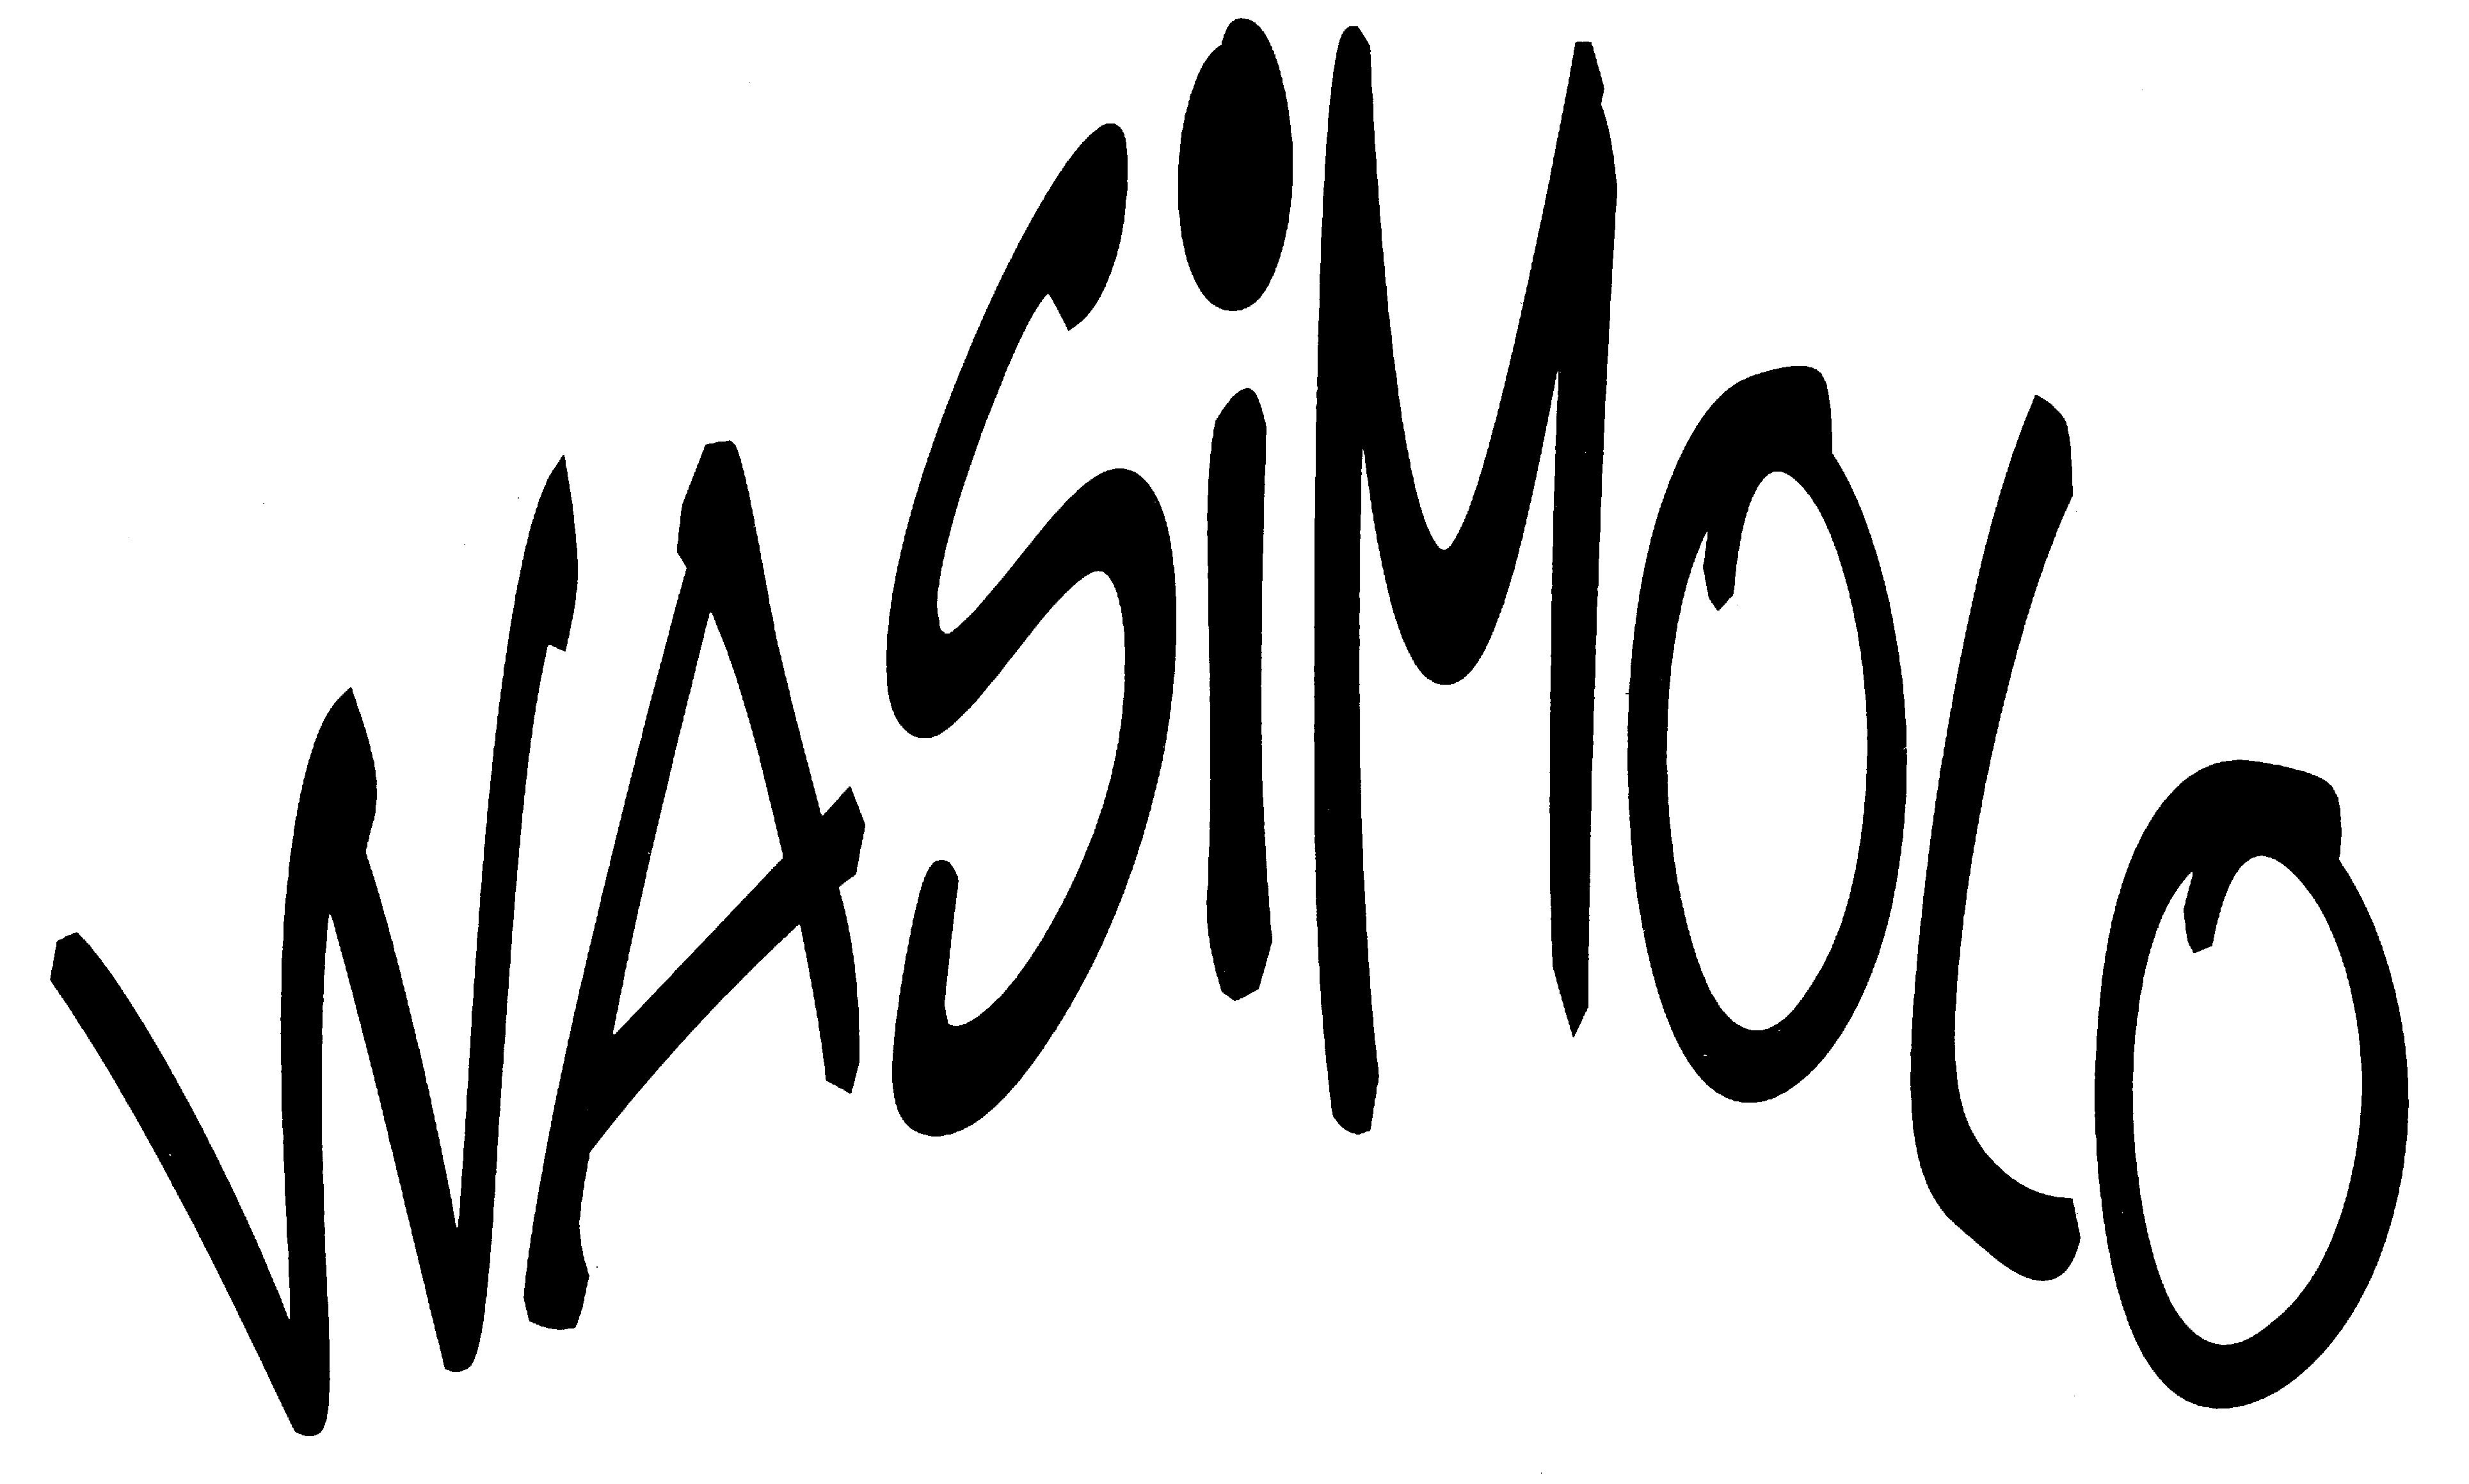 Wasimolo